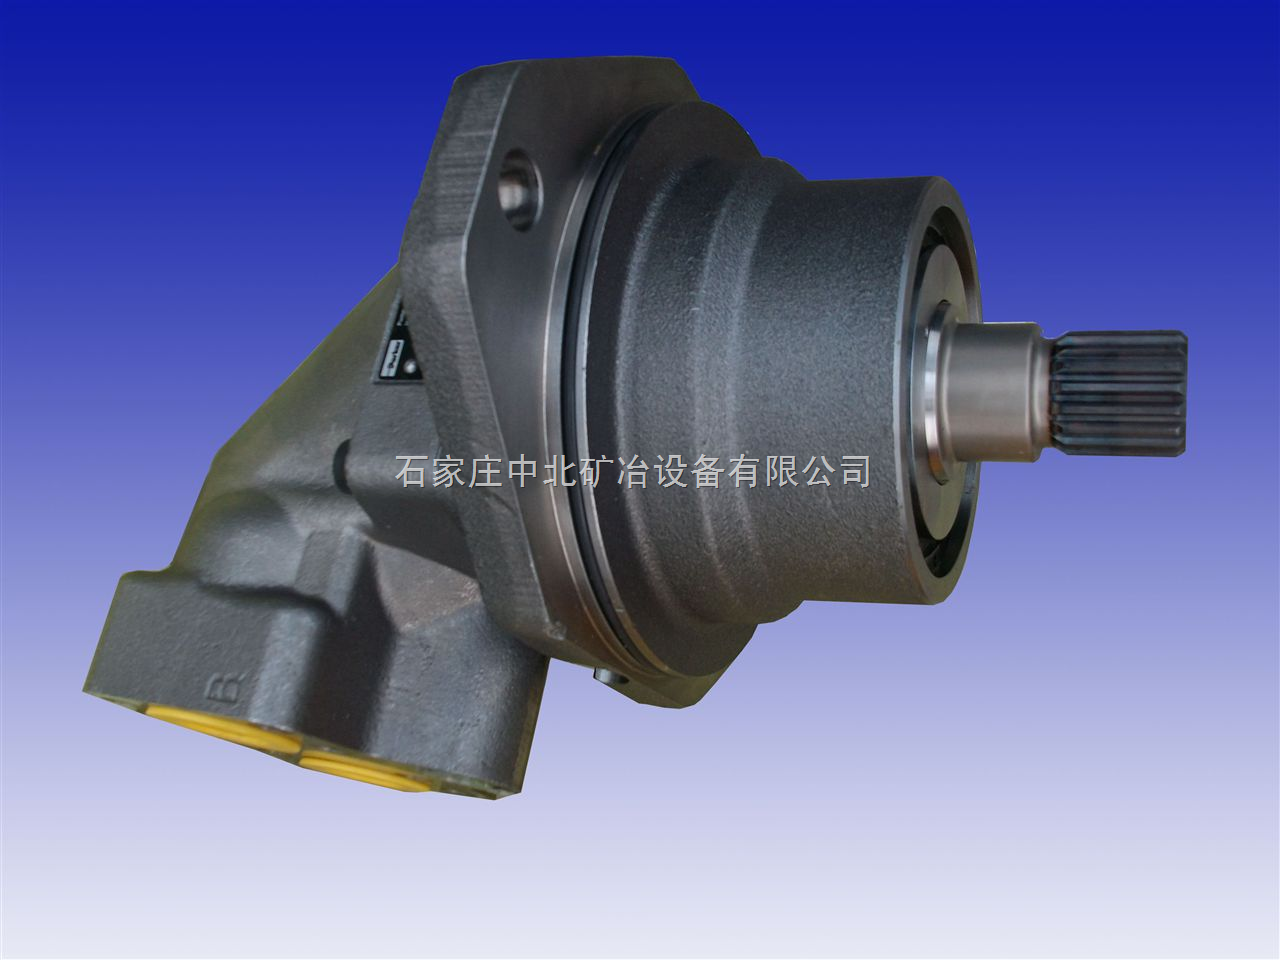 PARKER派克F12-125-MF-CV-C-000-000-0液压马达